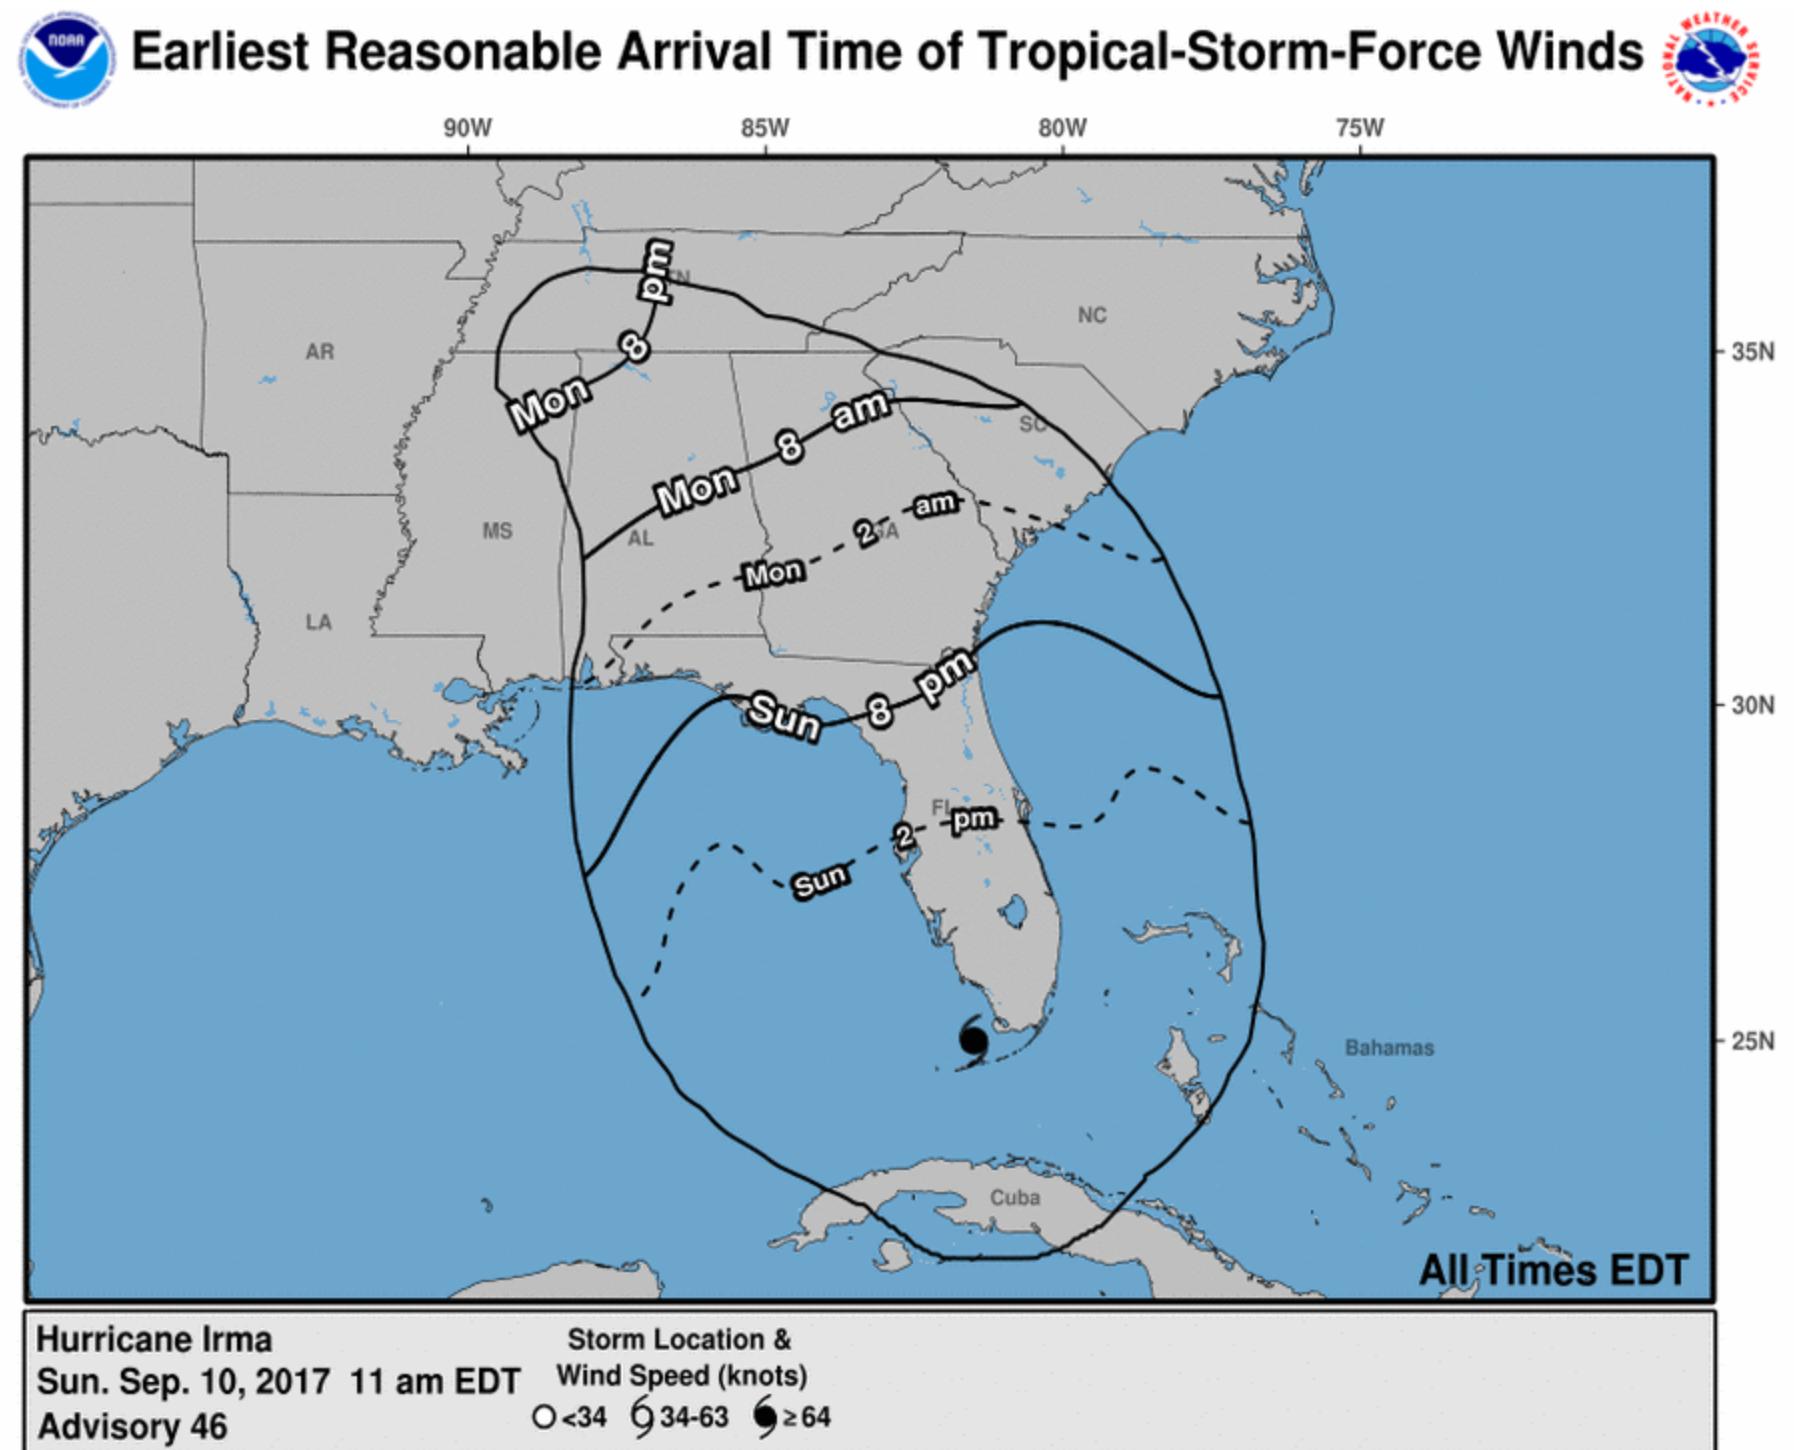 hurricane irma makes landfall in fl kills 3 100k in shelters